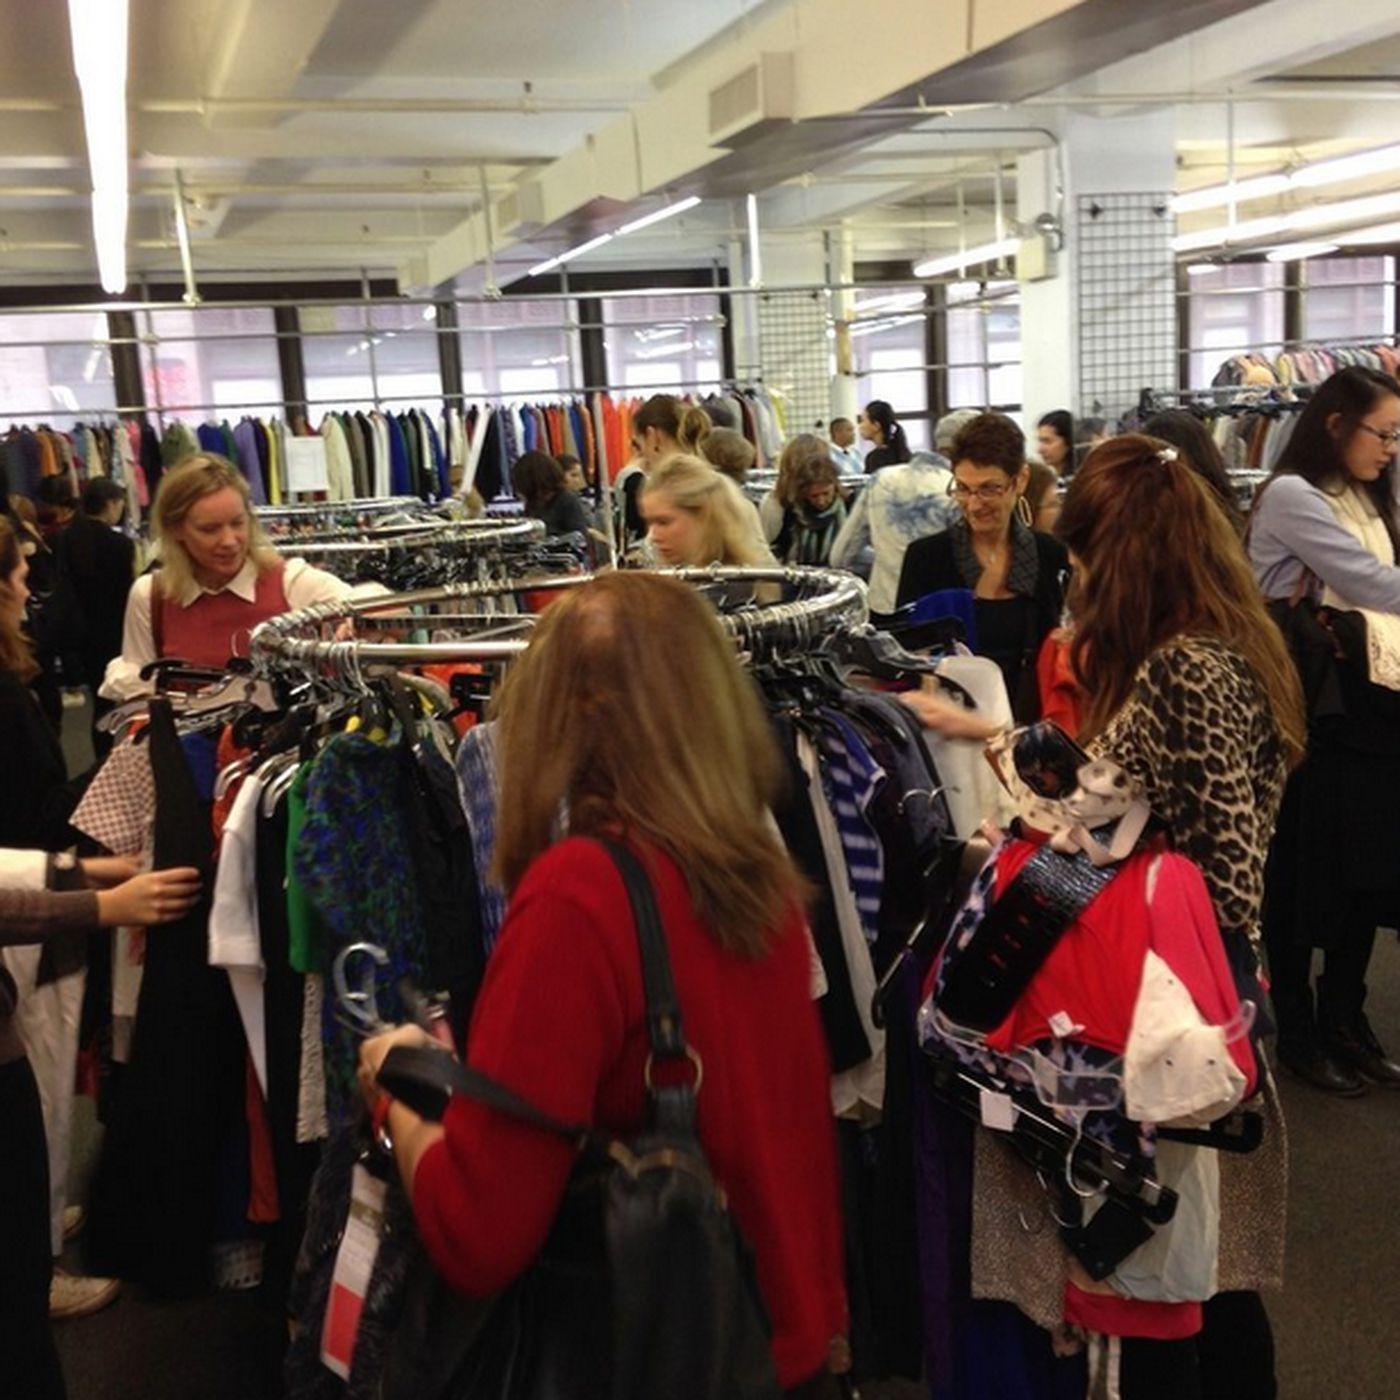 New york sample sale alert: club monaco | fashion. Style. Beauty.